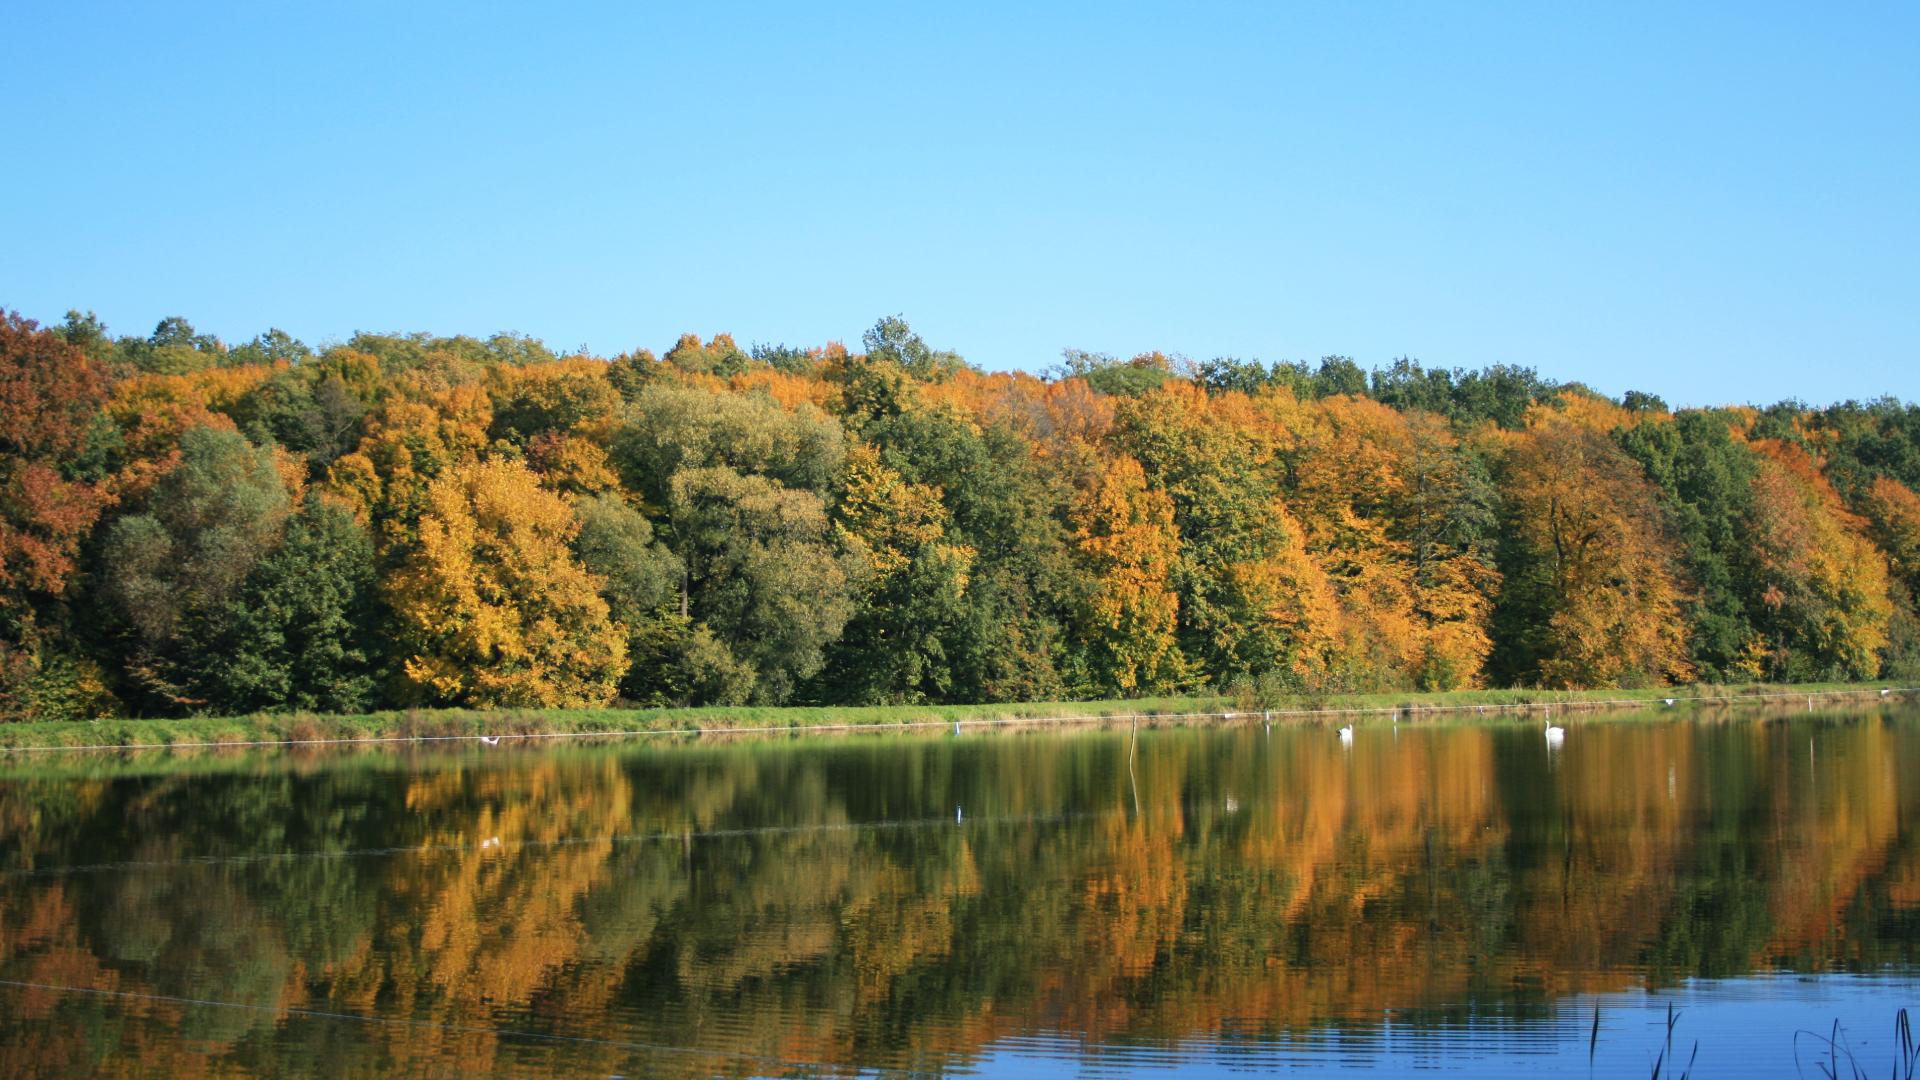 autumn - Październik